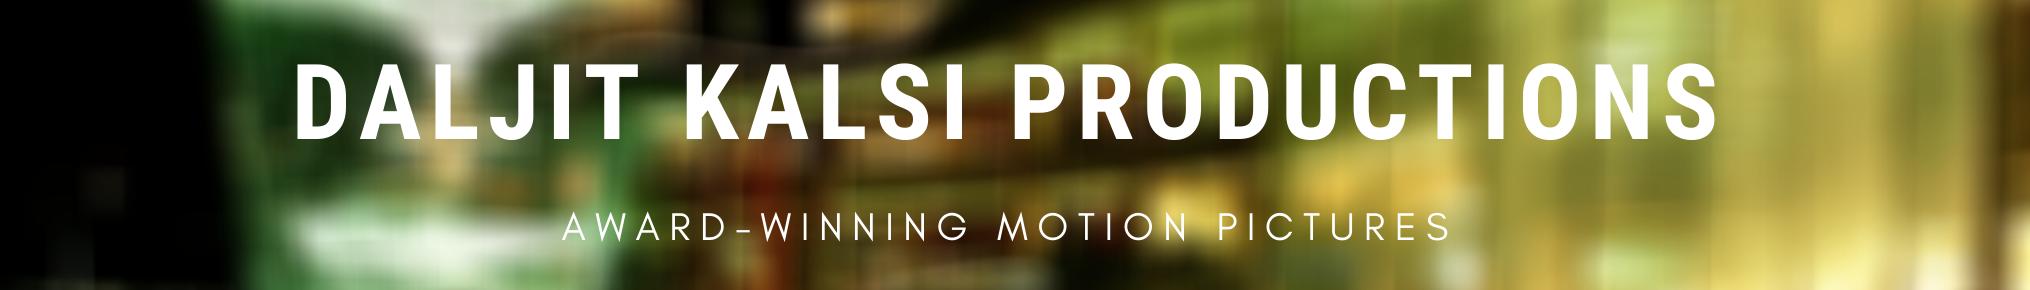 Daljit Kalsi Productions